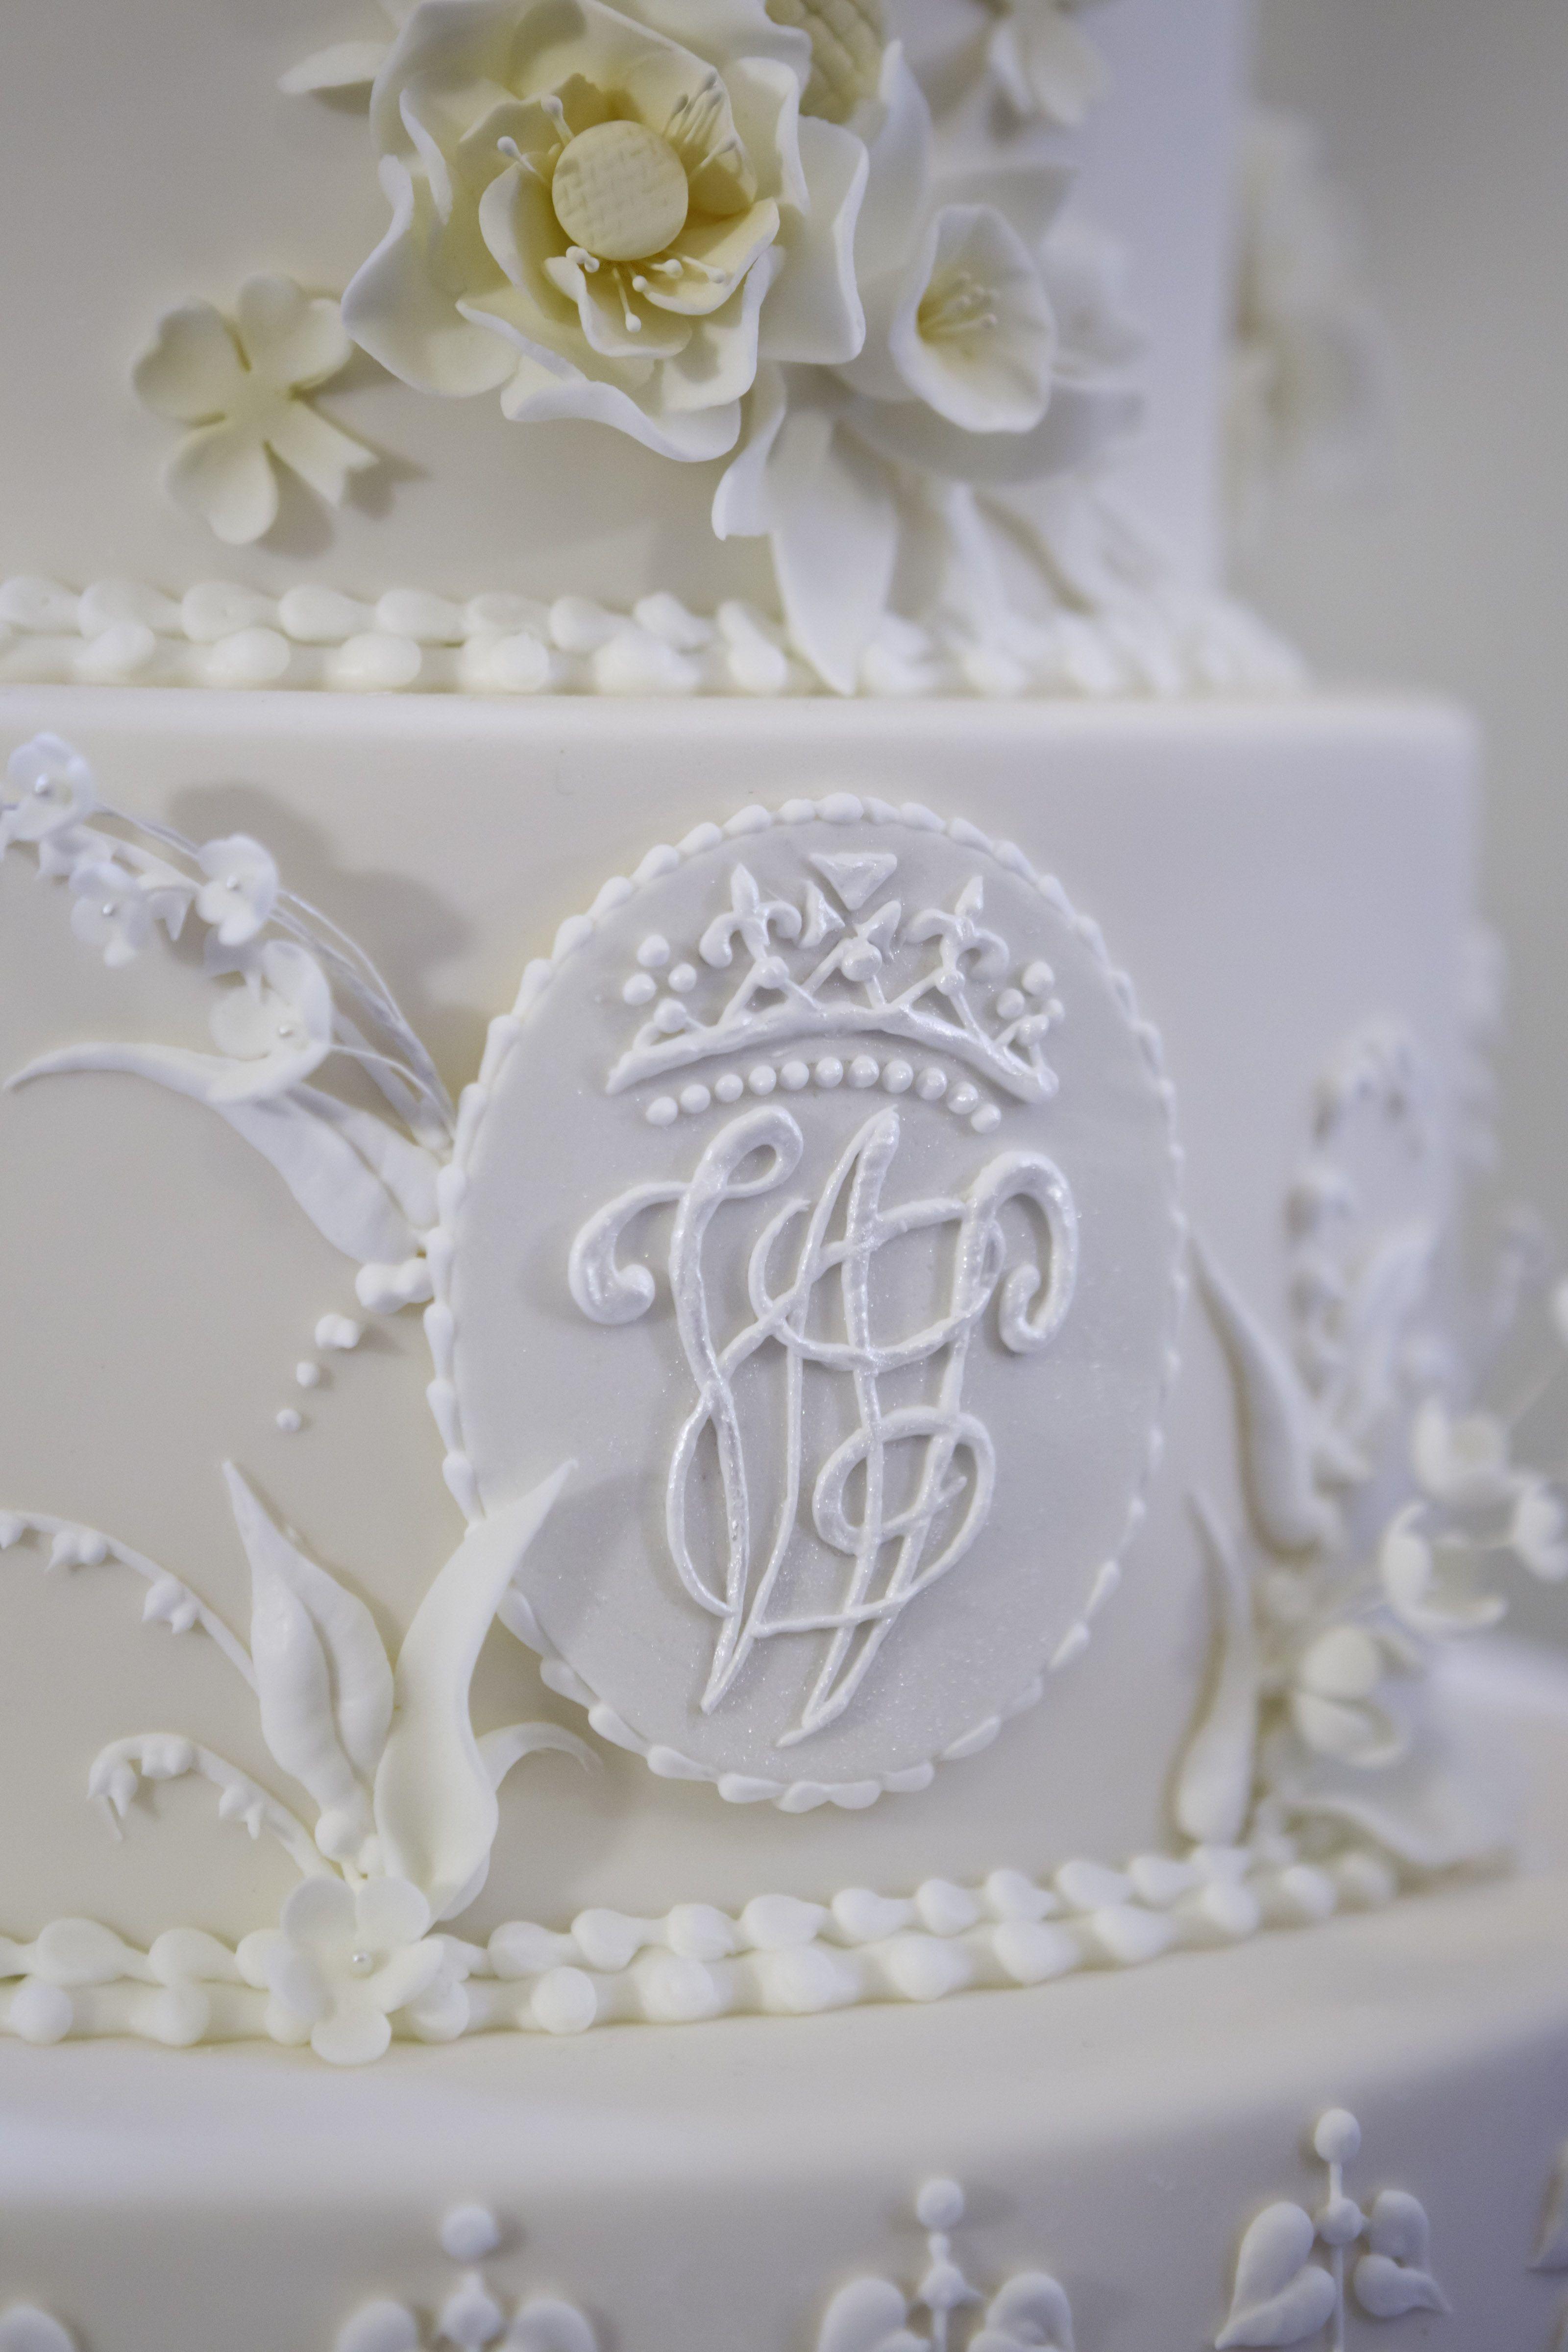 William Kates Royal Wedding Cake A Close Up Of The Monogram Initials